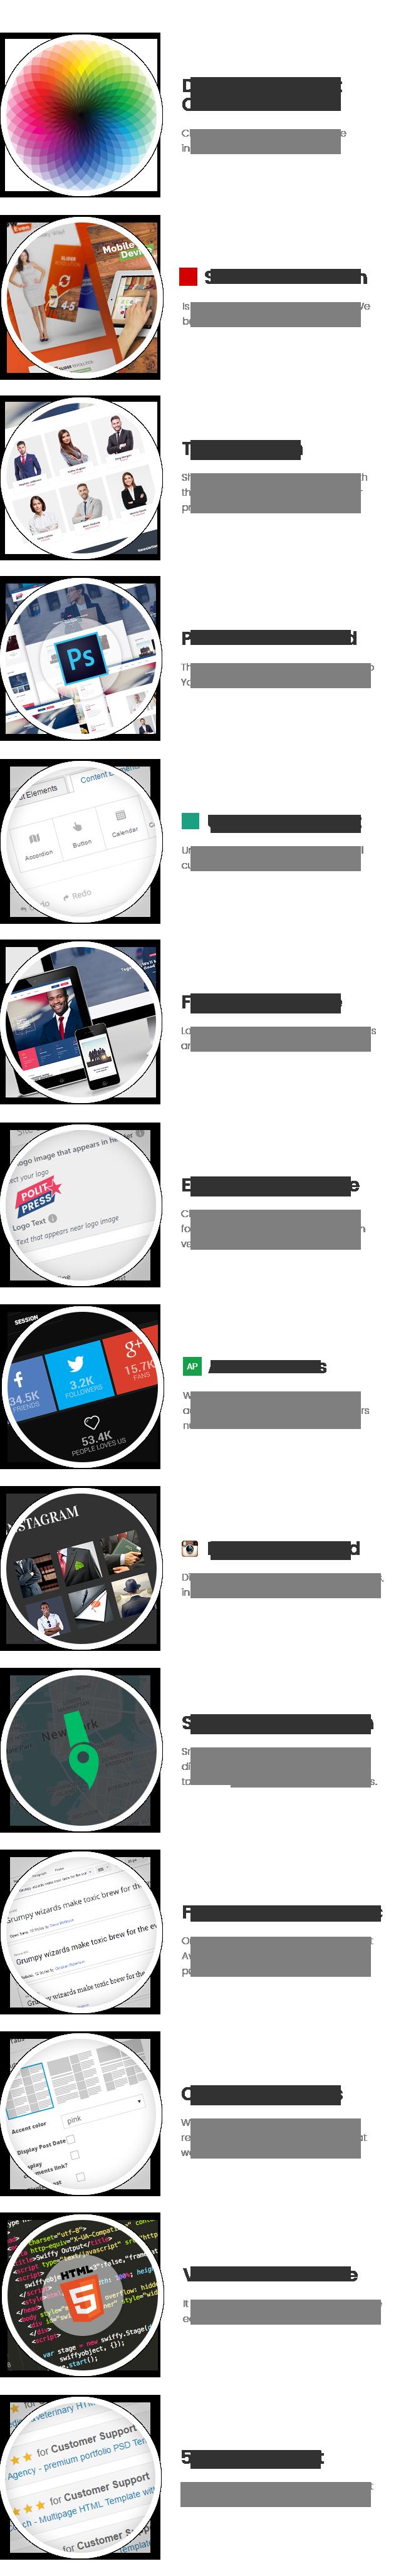 Politpress - Election Campaign and Political WordPress theme